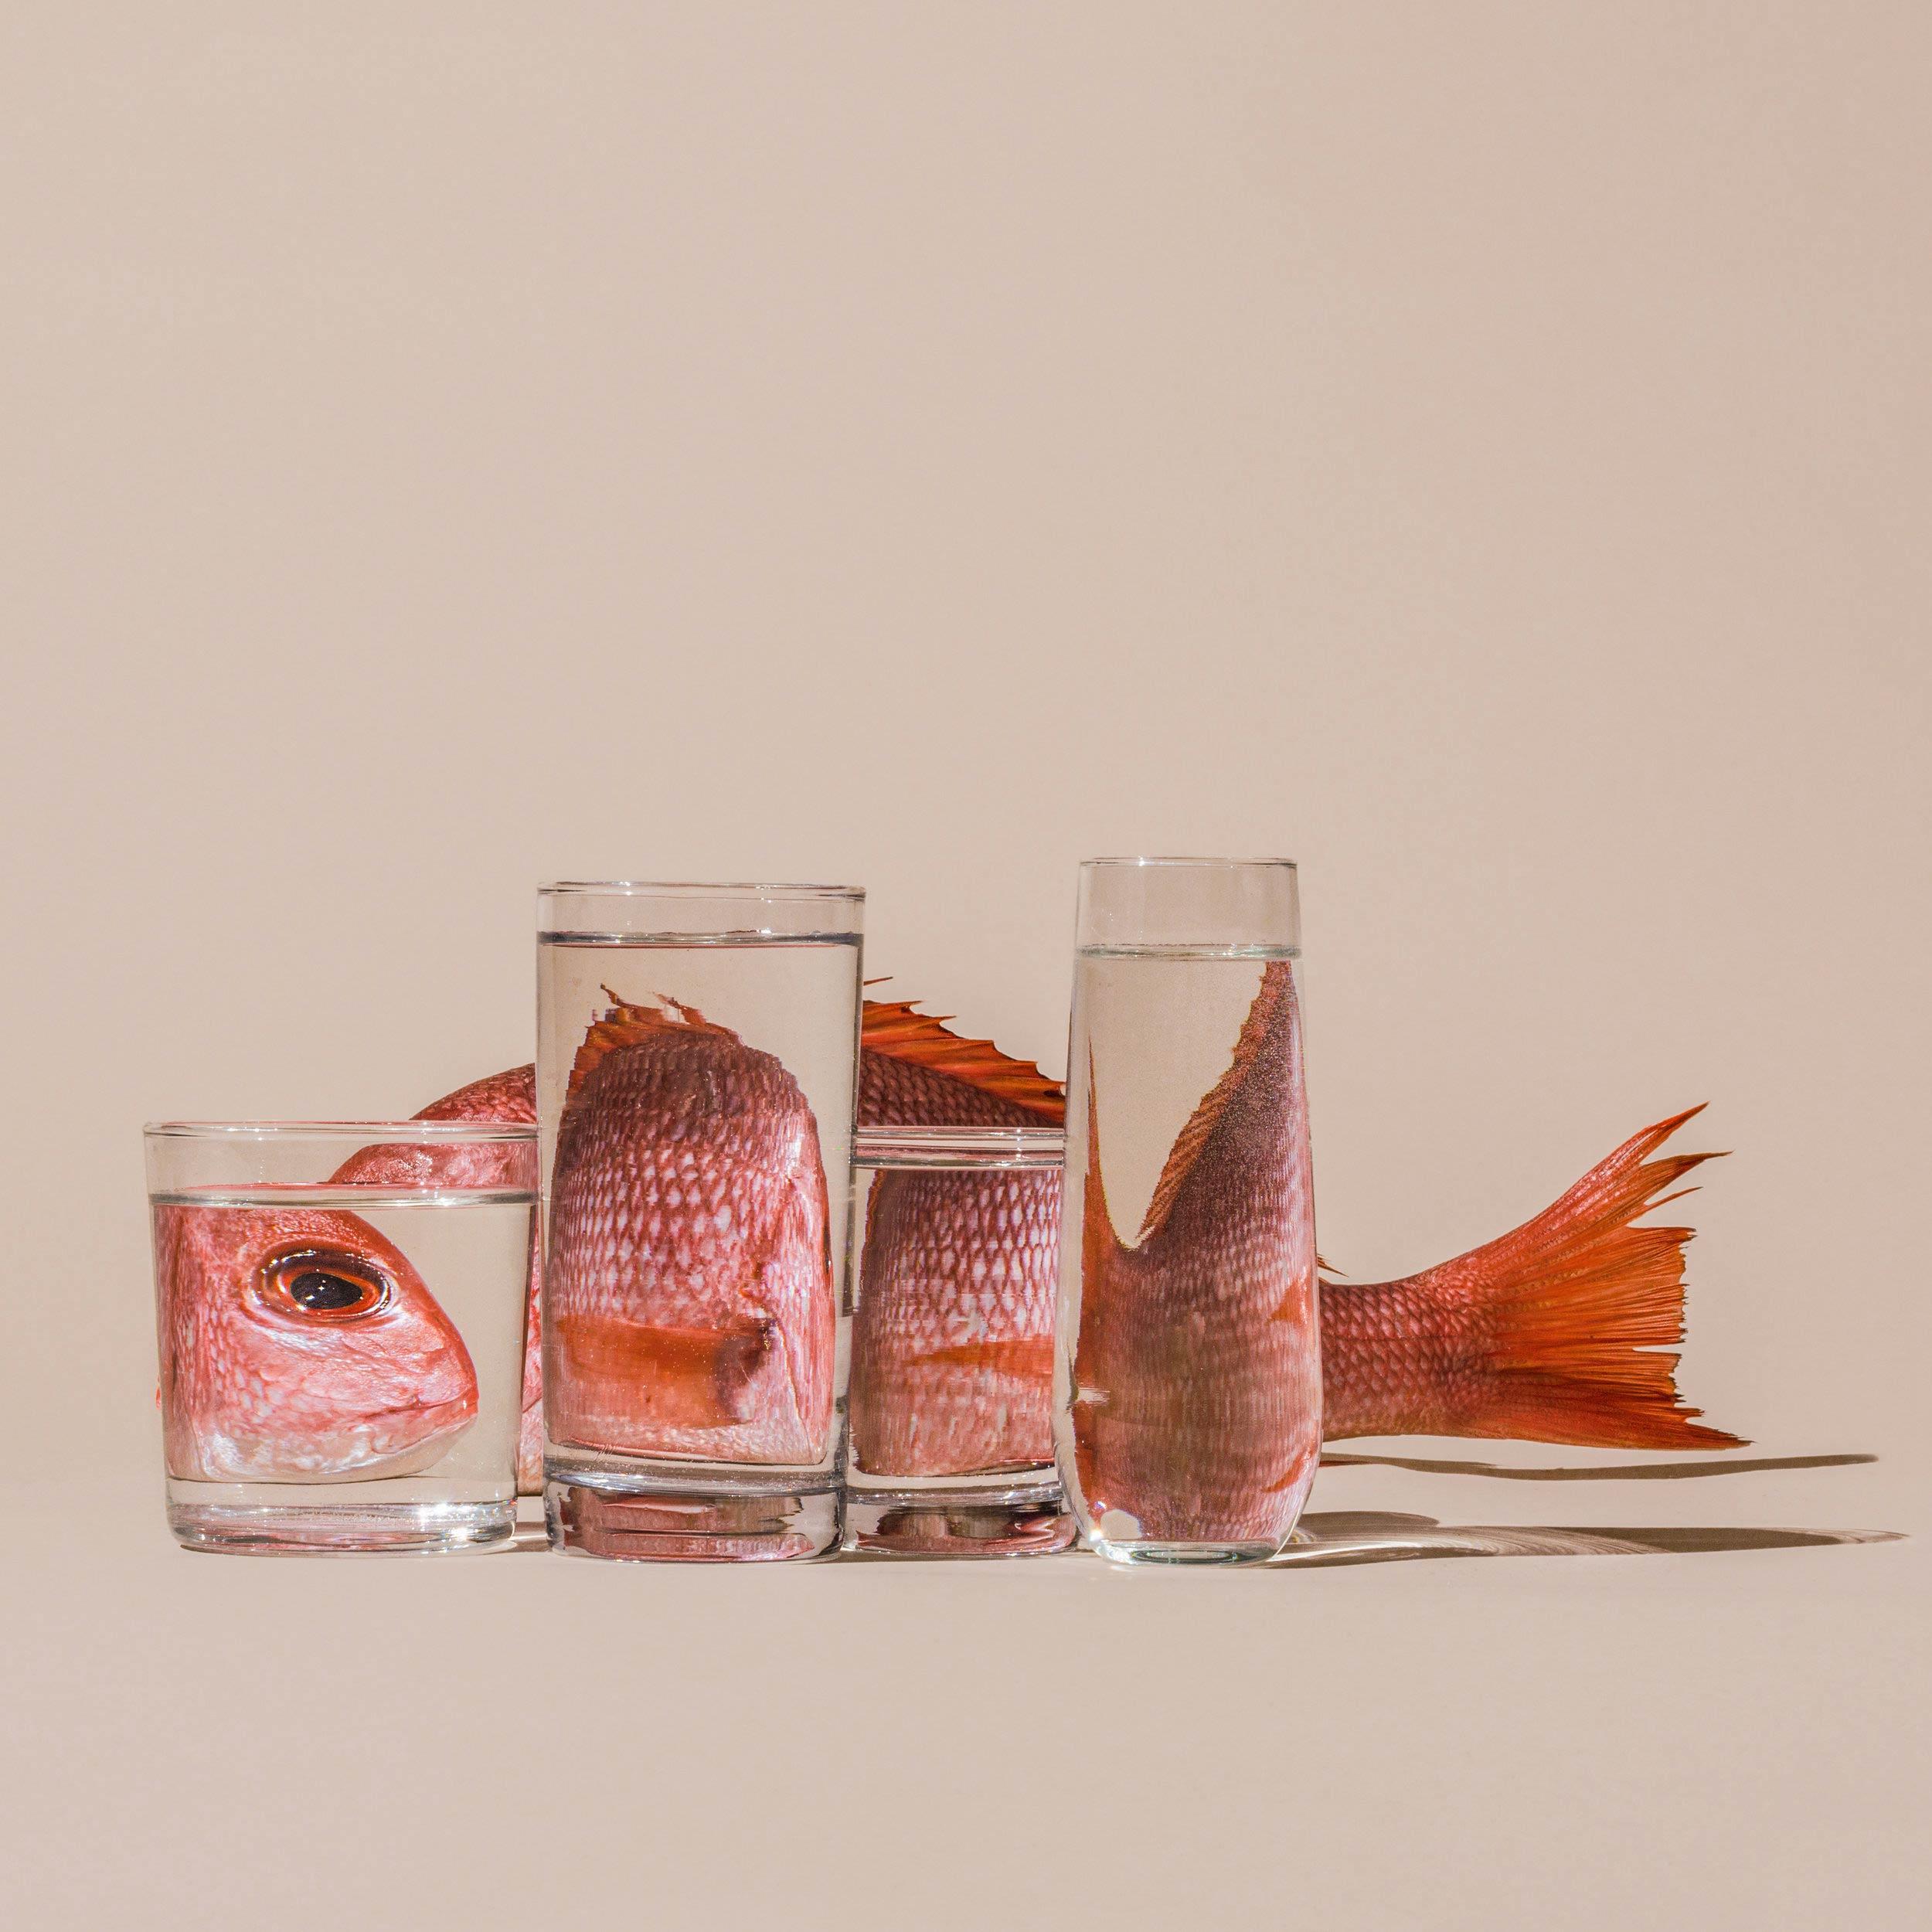 distorded-susan-sakoff-still-life-photography-1